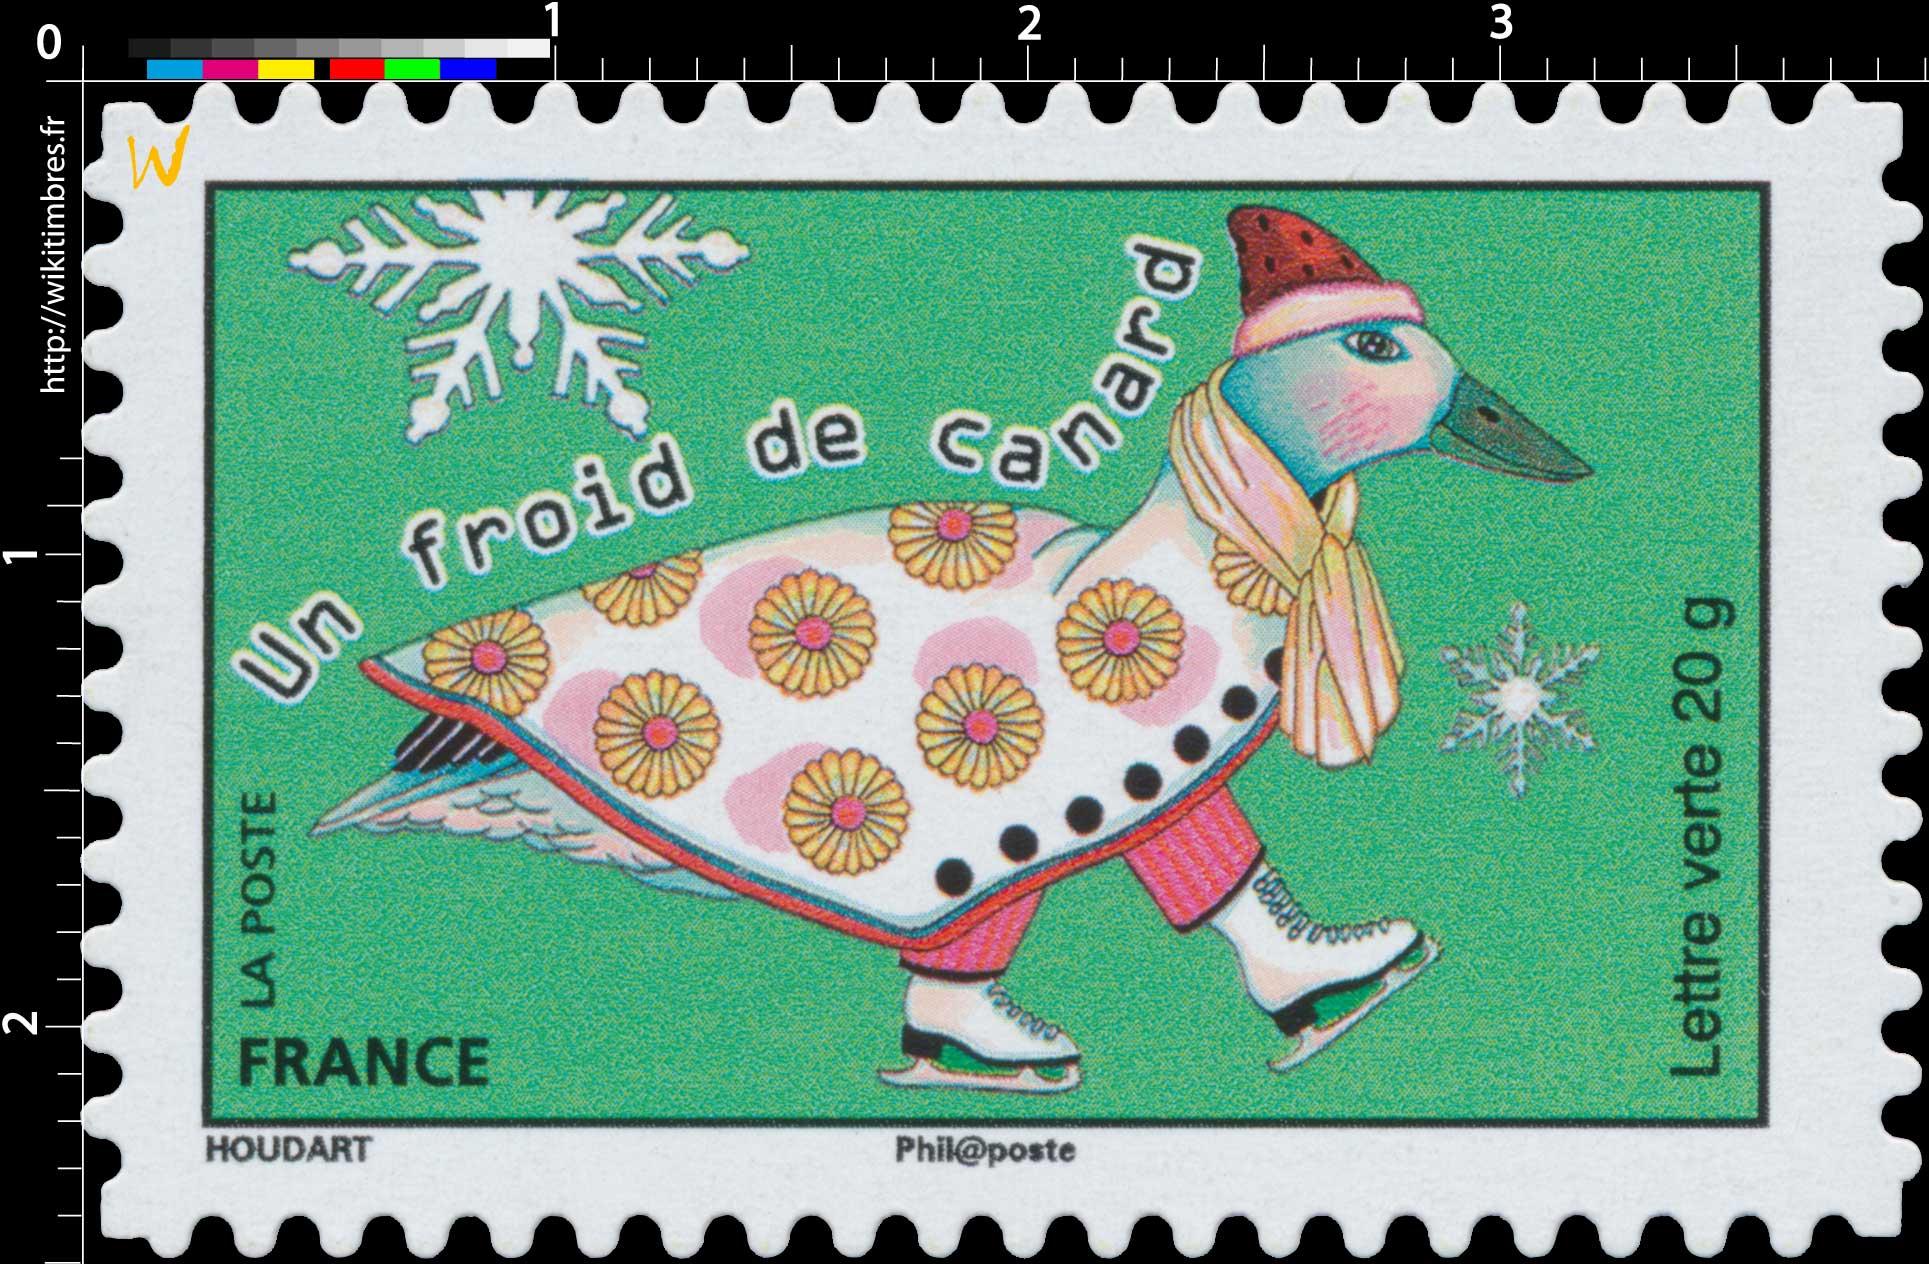 2015 Un froid de canard